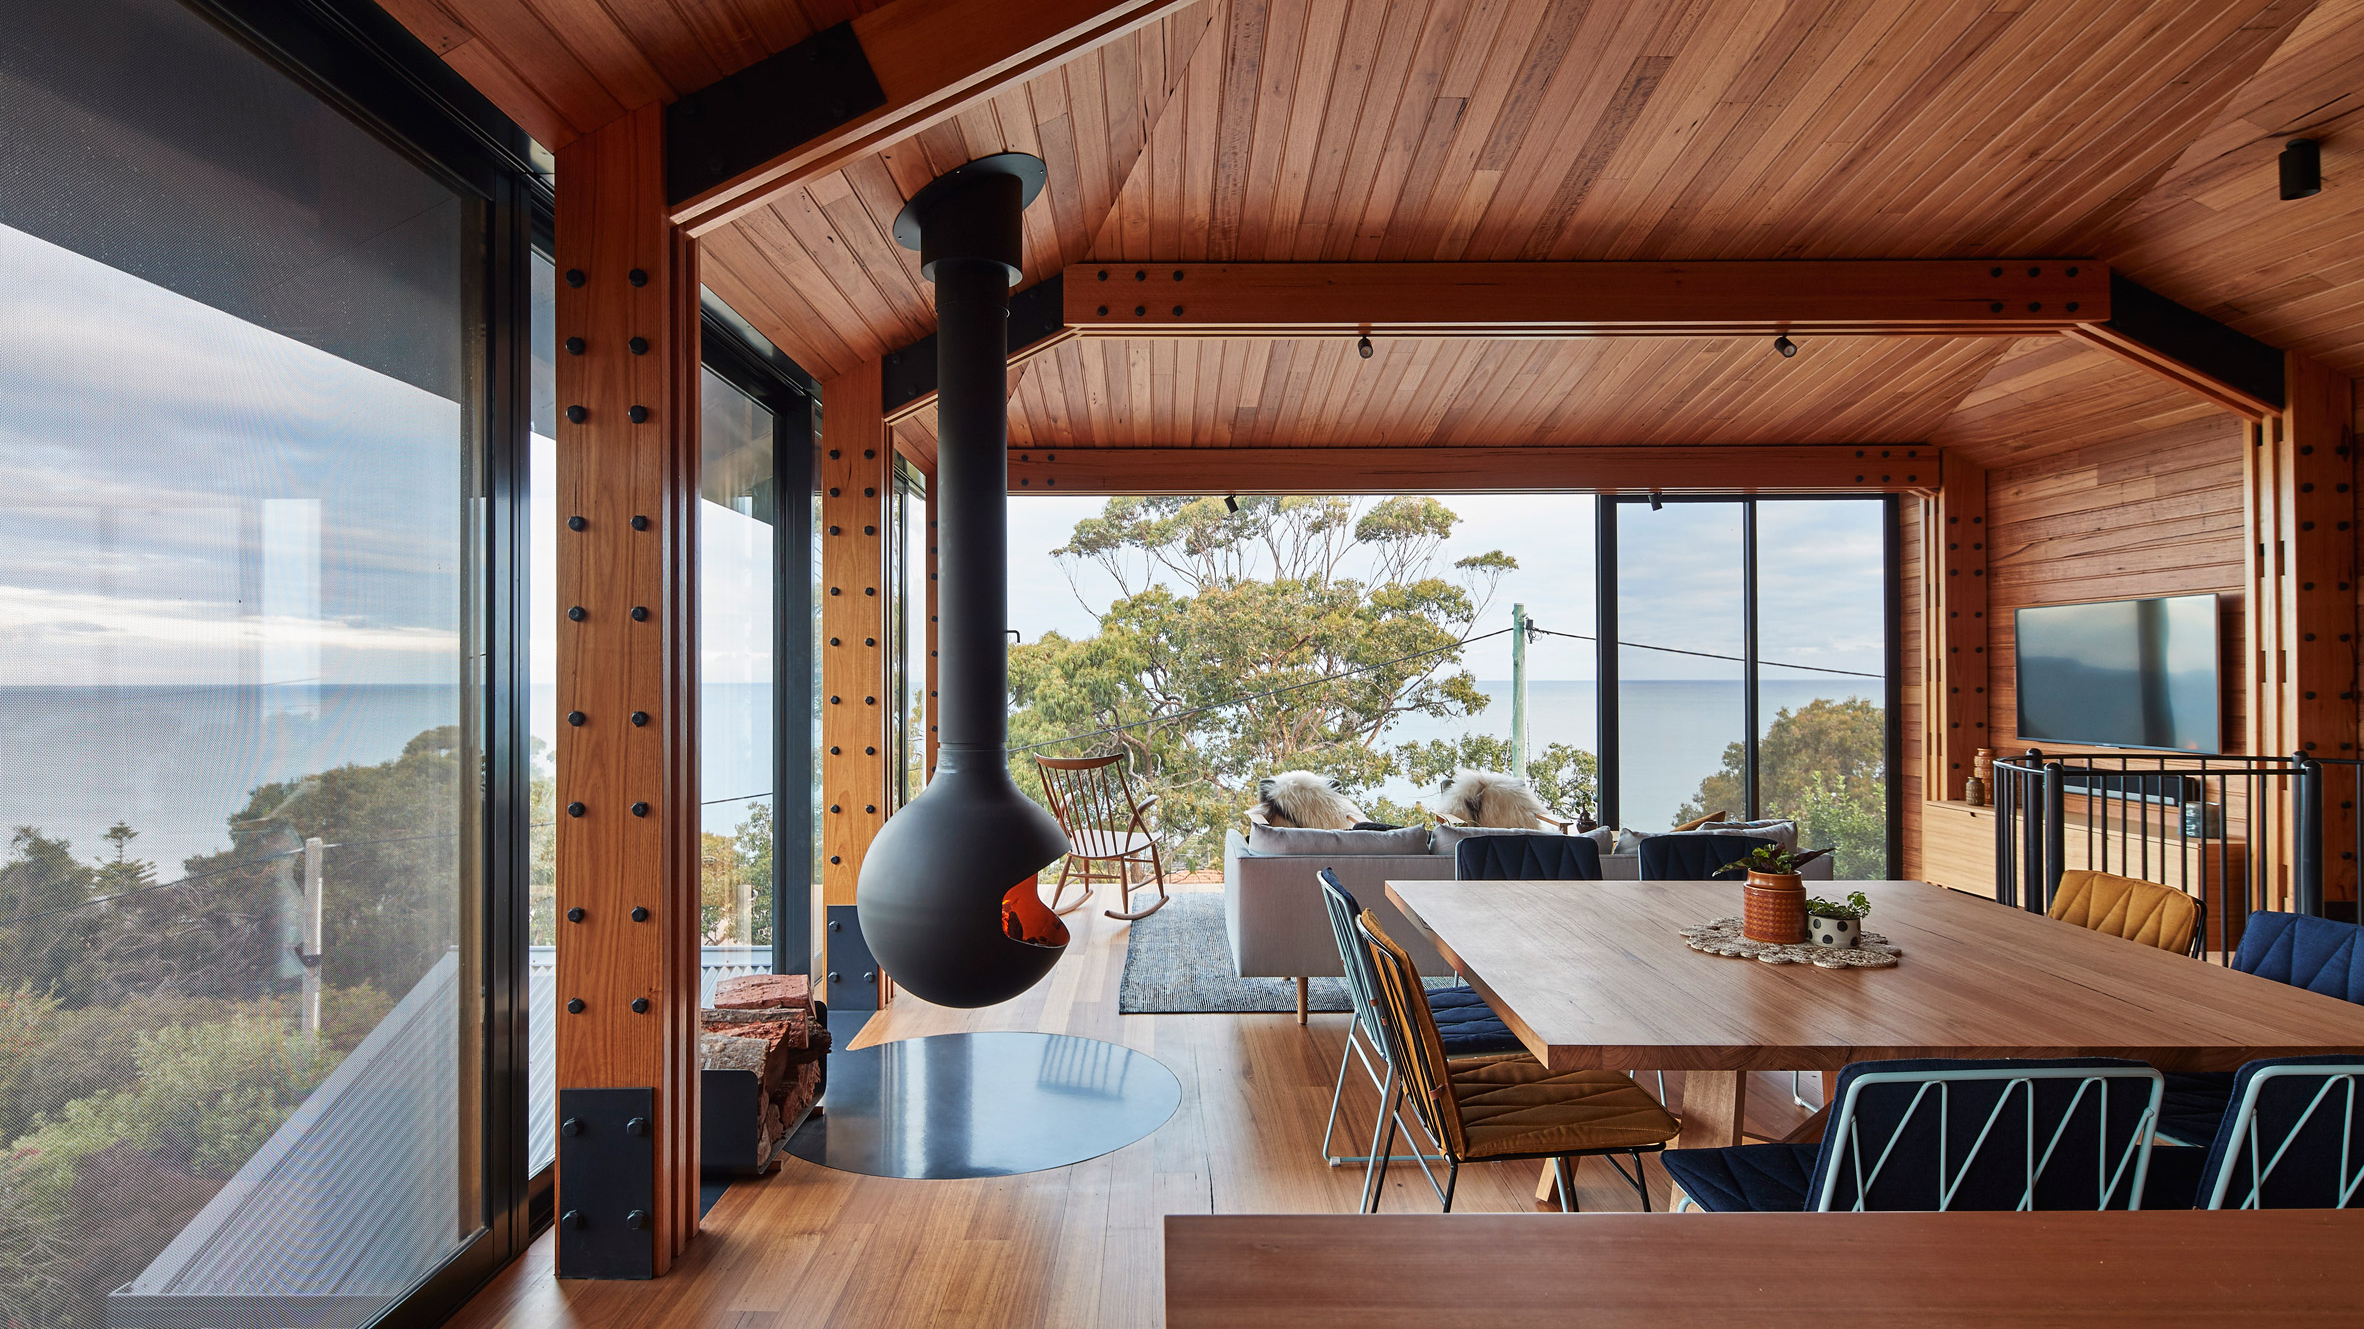 Glasshouse On Stilts By Austin Maynard Architects Extends Australian Beach  Shack